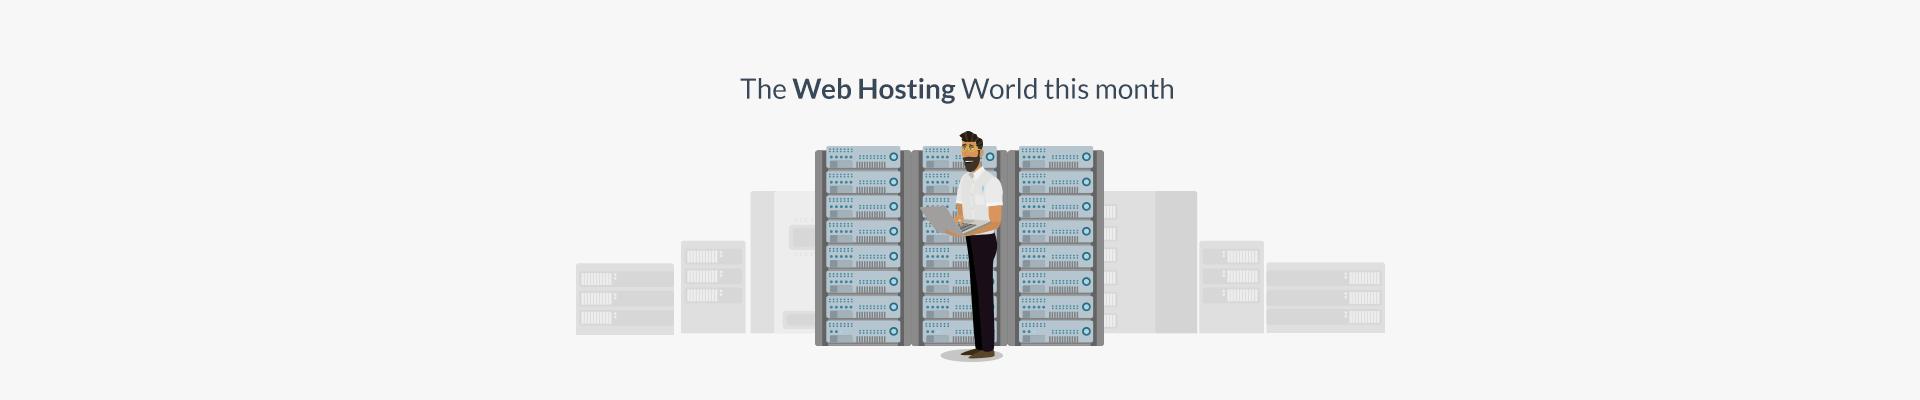 Plesk Web Hosting News - November 2018